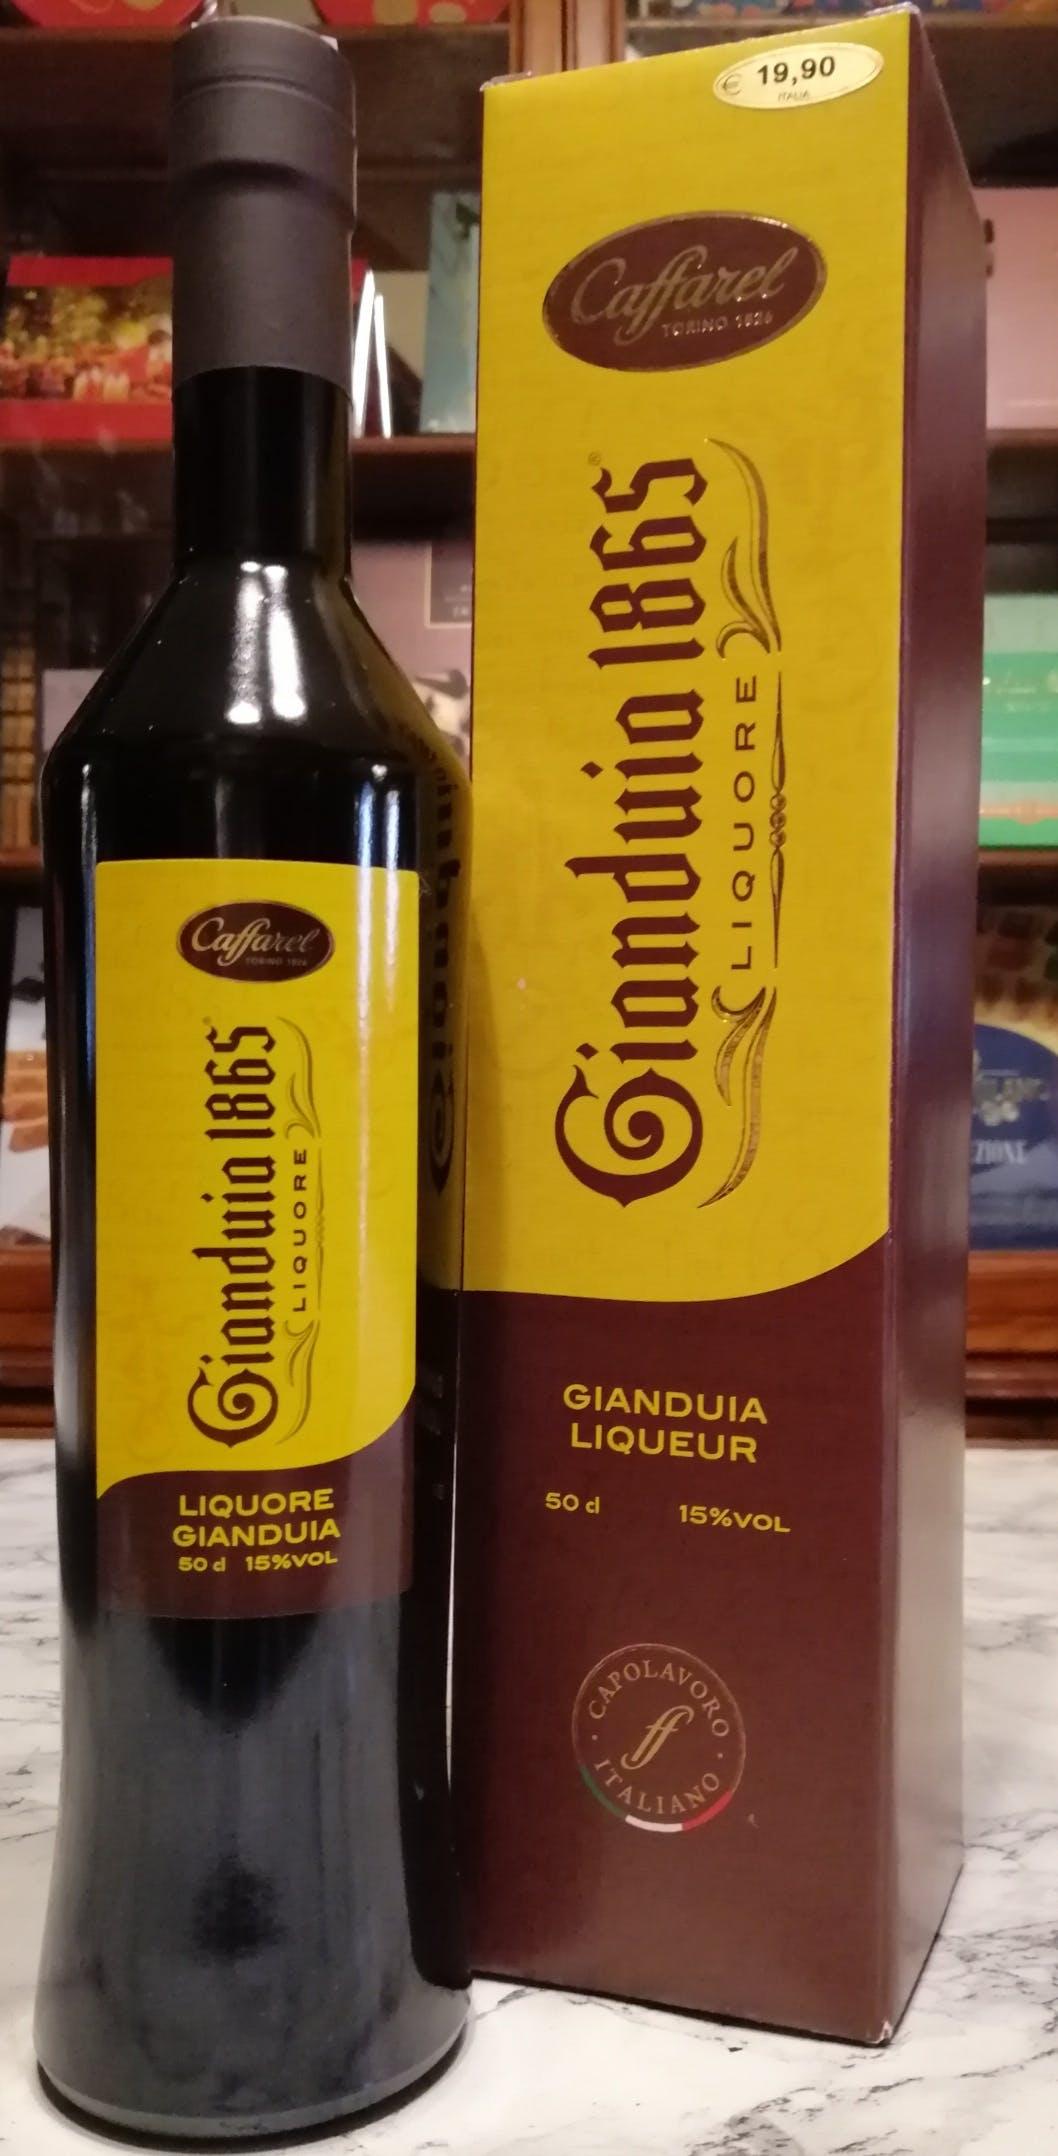 Liquore al Gianduia